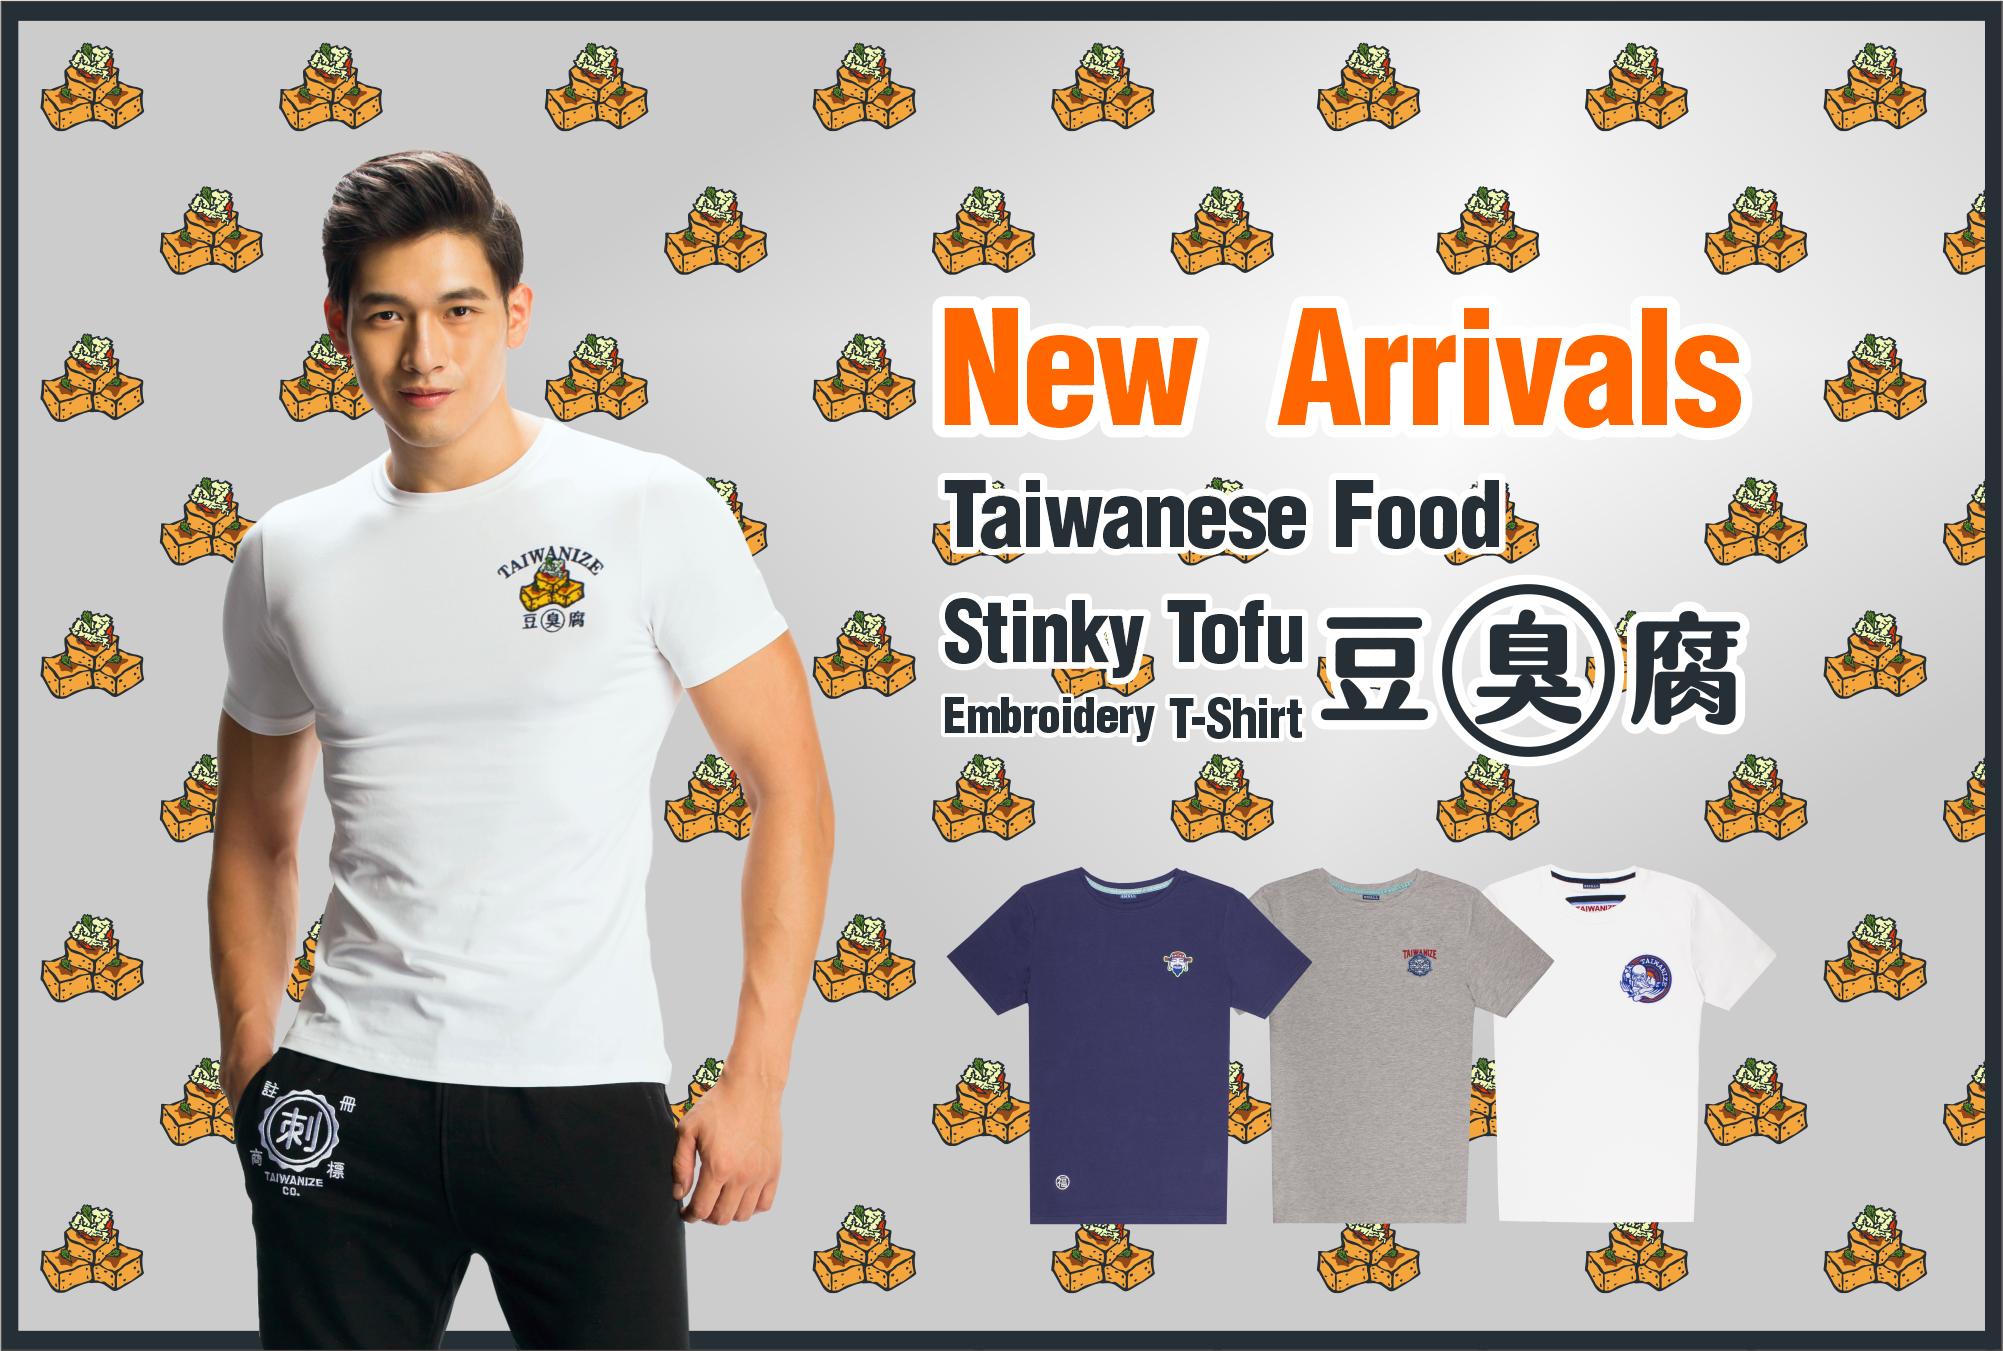 Taiwanese Food Stinky Tofu Embroidery T-Shirt